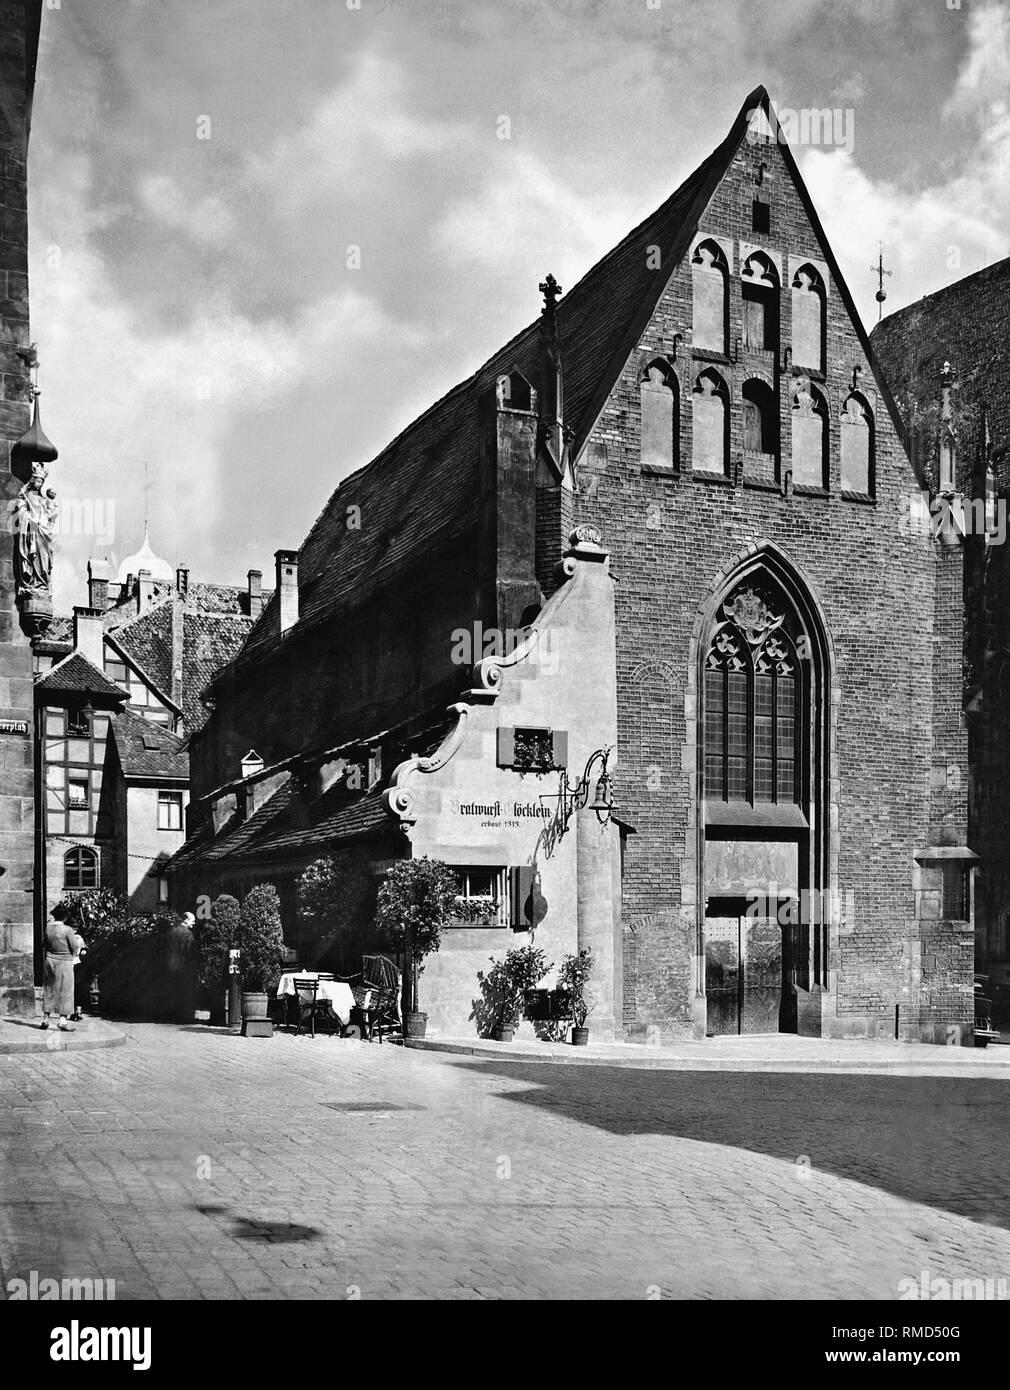 The restaurant Bratwurstgloecklein at the Moritzkapelle opposite the St. Sebaldus Church in the Gloeckleinsgasse. The Nuremberg restaurant was completely destroyed by bombing in 1944. - Stock Image